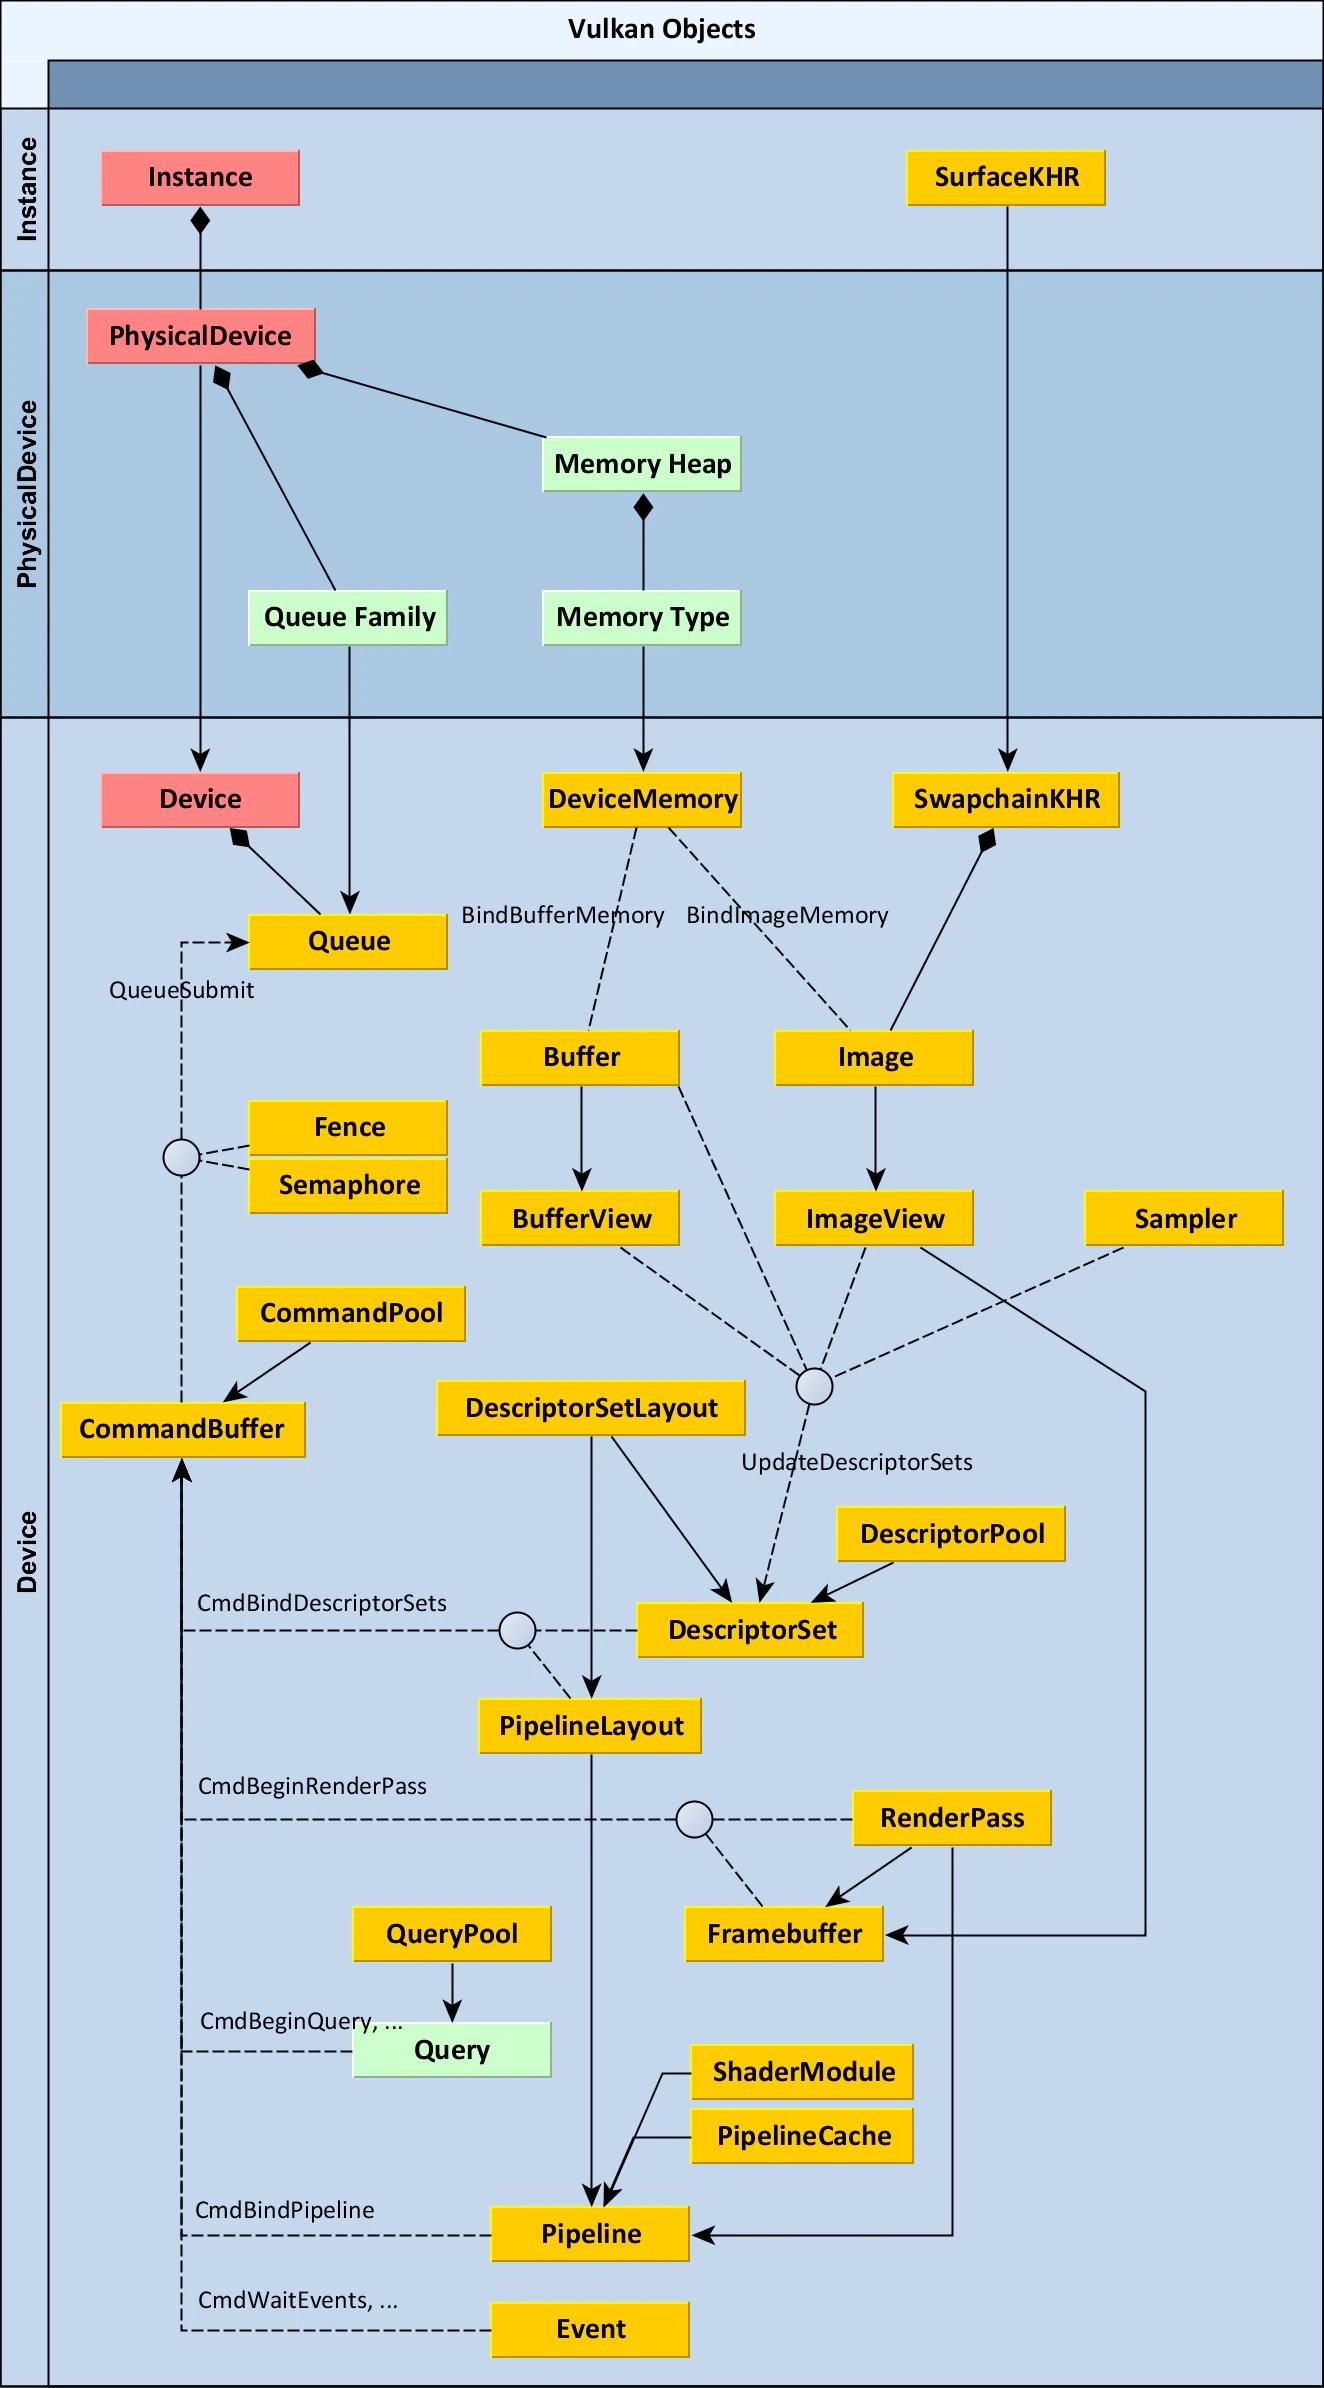 hight resolution of vulkan object diagram